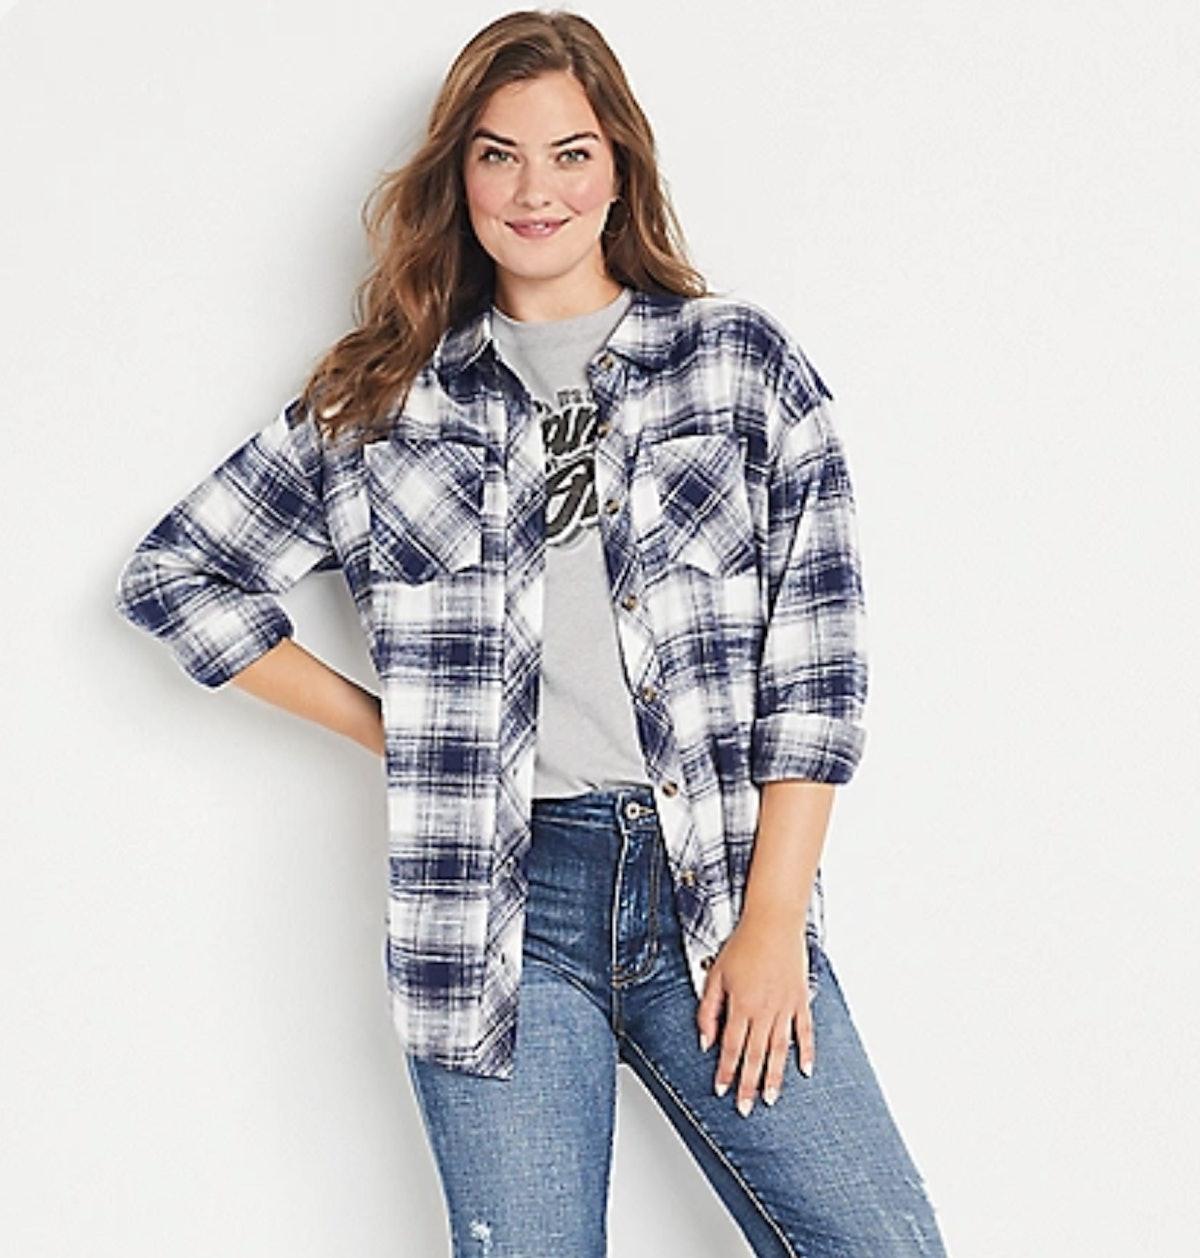 Stevie Budd from 'Shitt's Creek' loves flannel shirts.